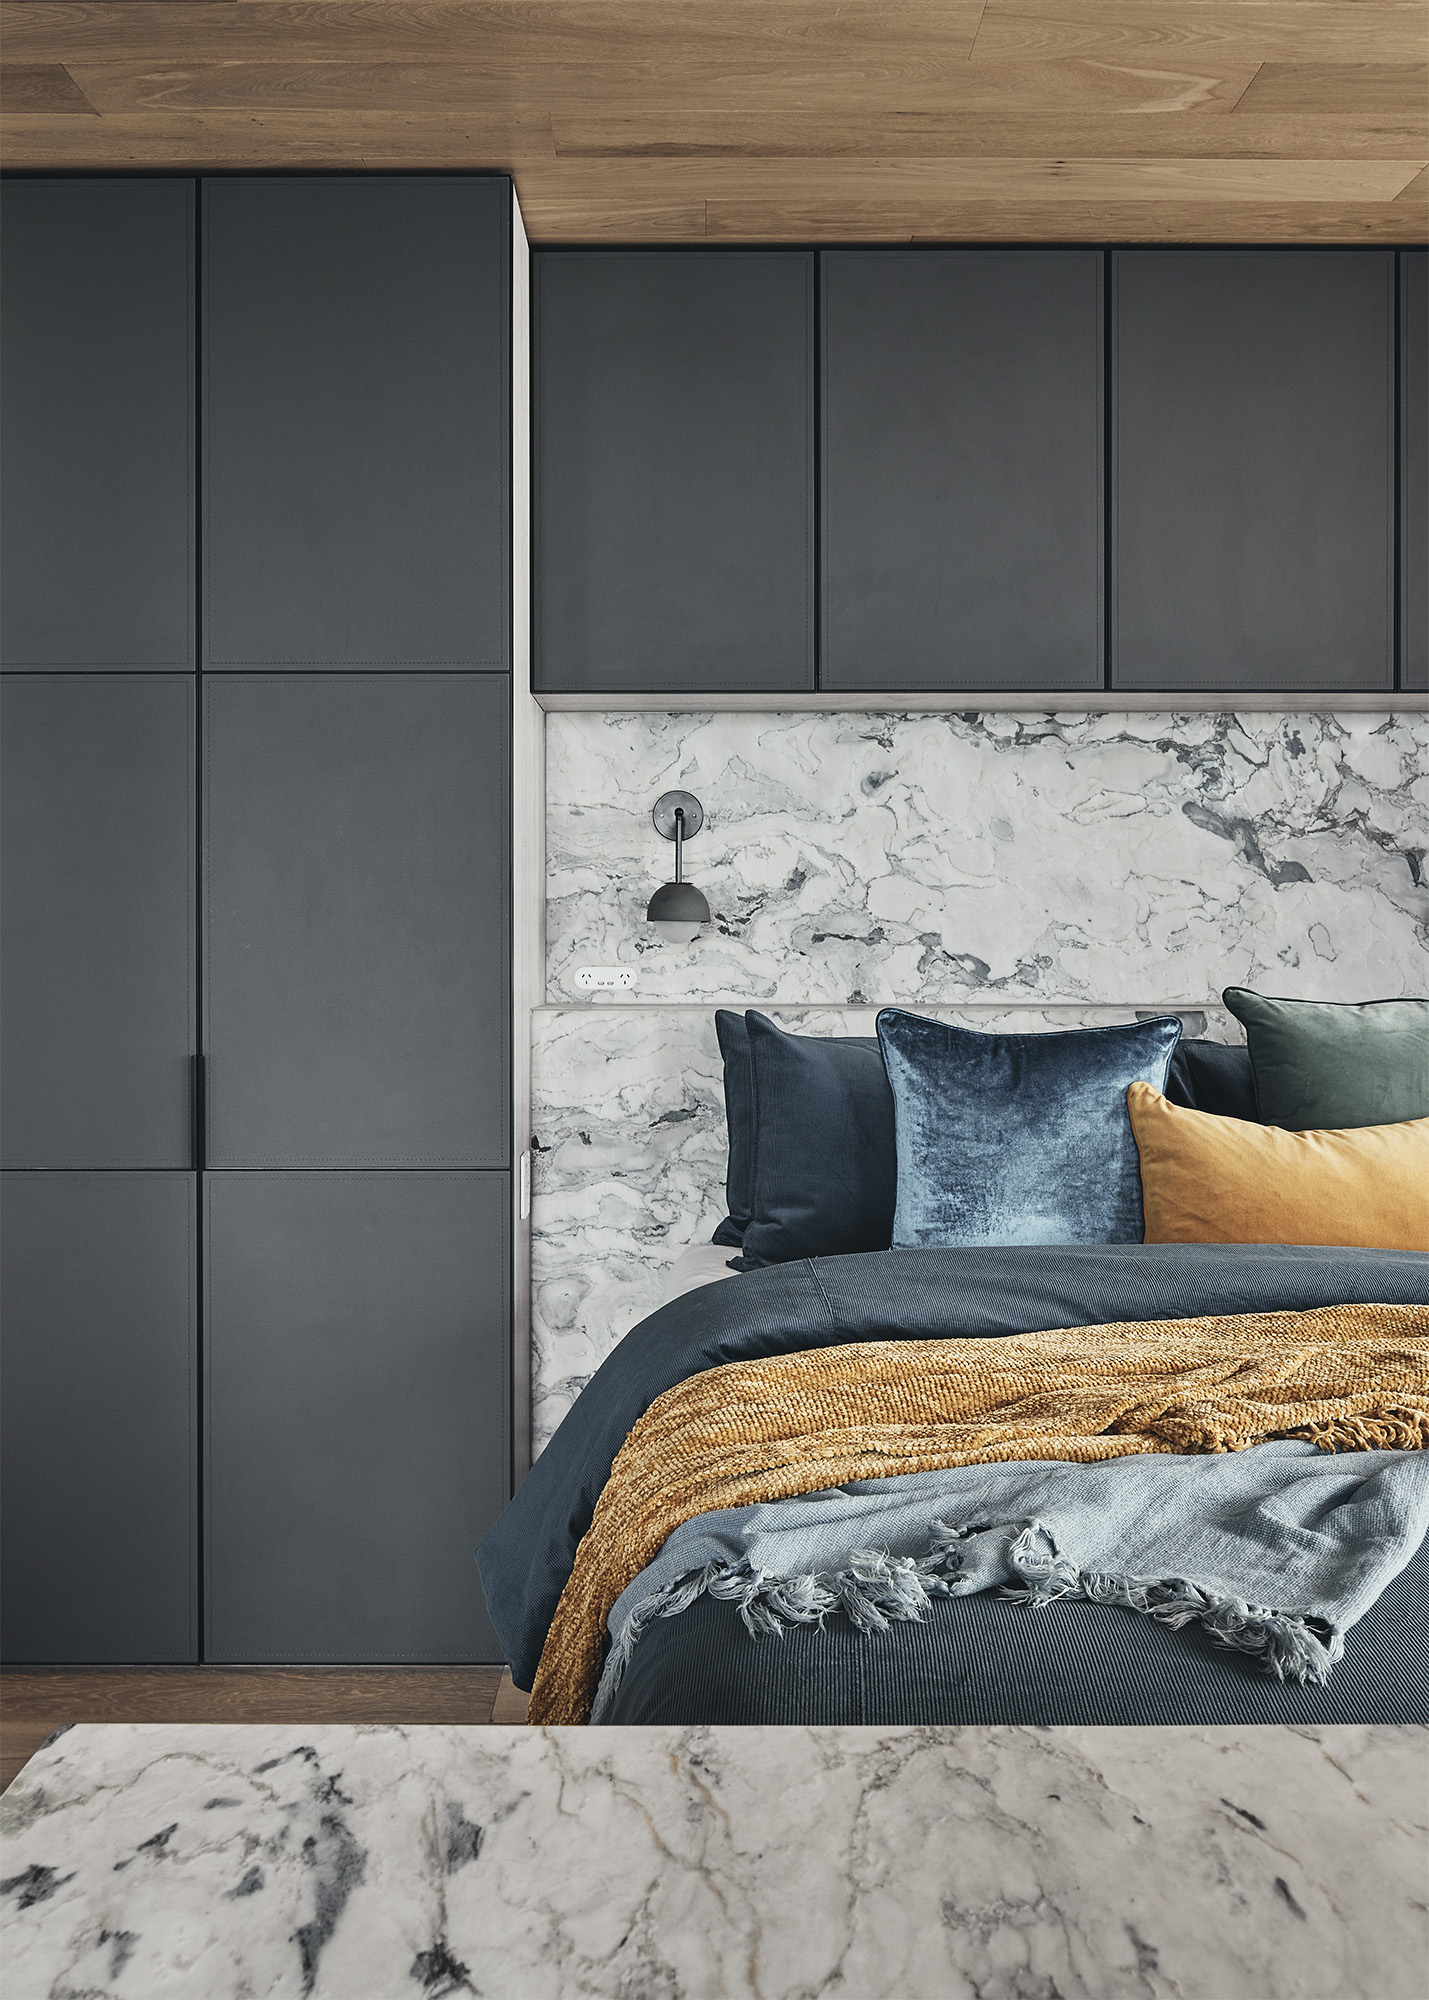 master bedroom with black wardrobes